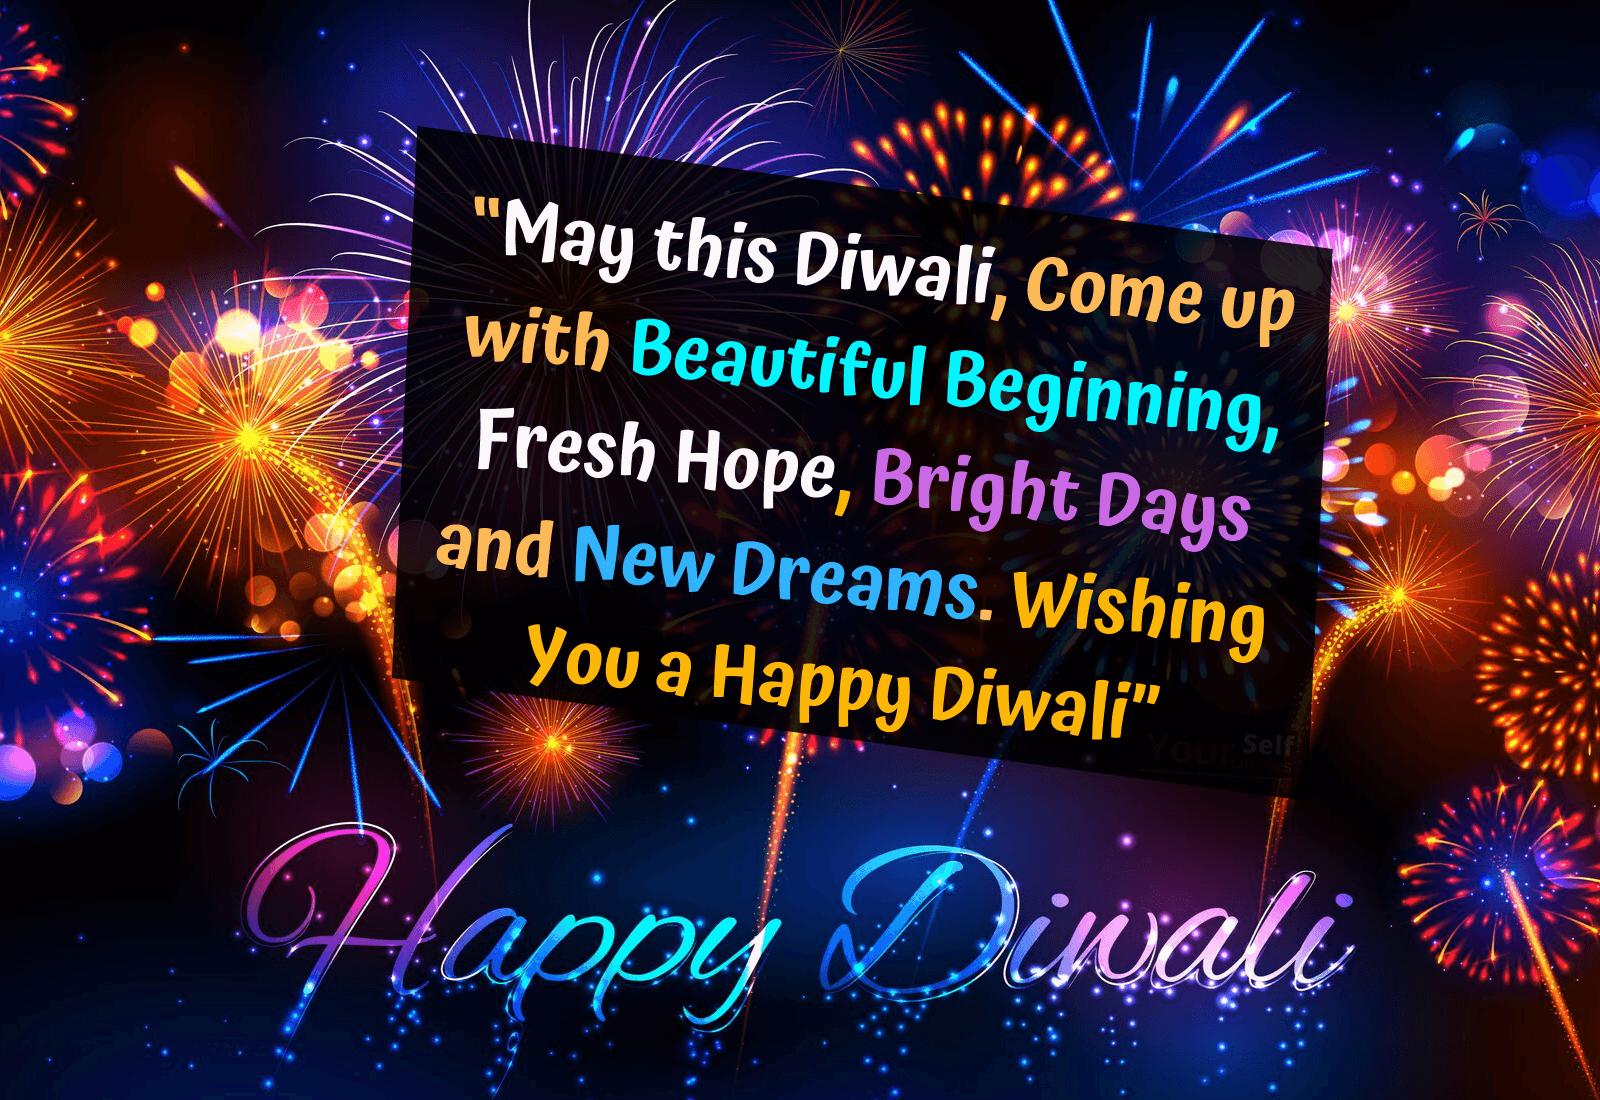 Diwali Cute Wishes Twitter thumbnail